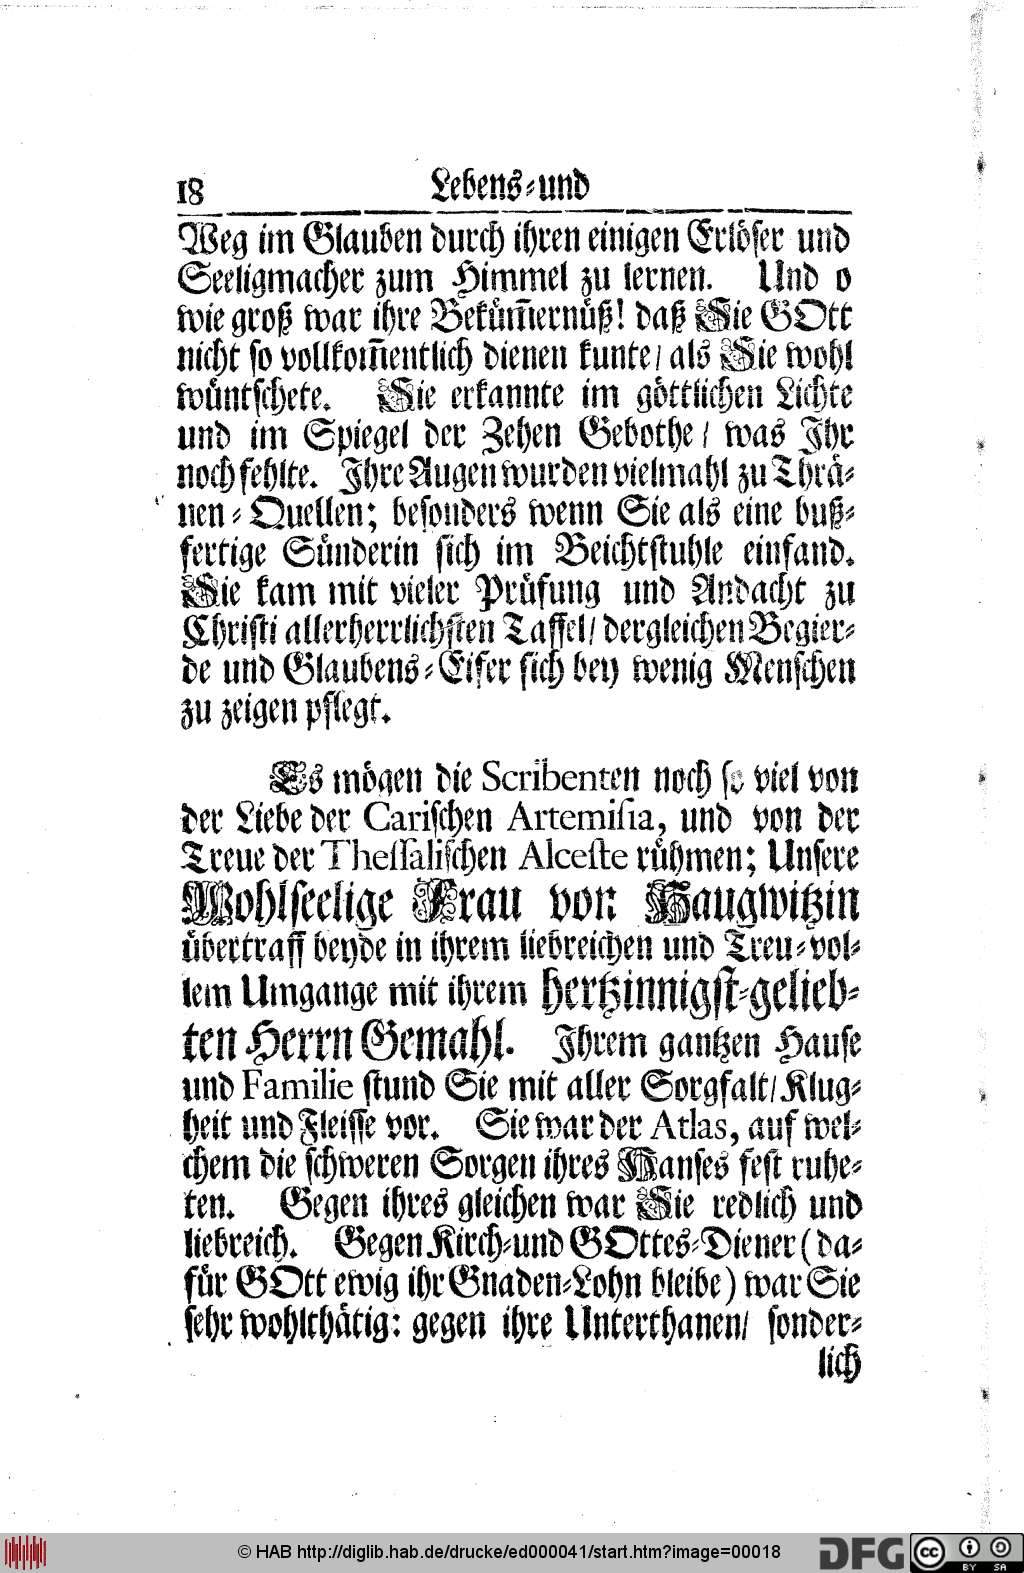 http://diglib.hab.de/drucke/ed000041/00018.jpg